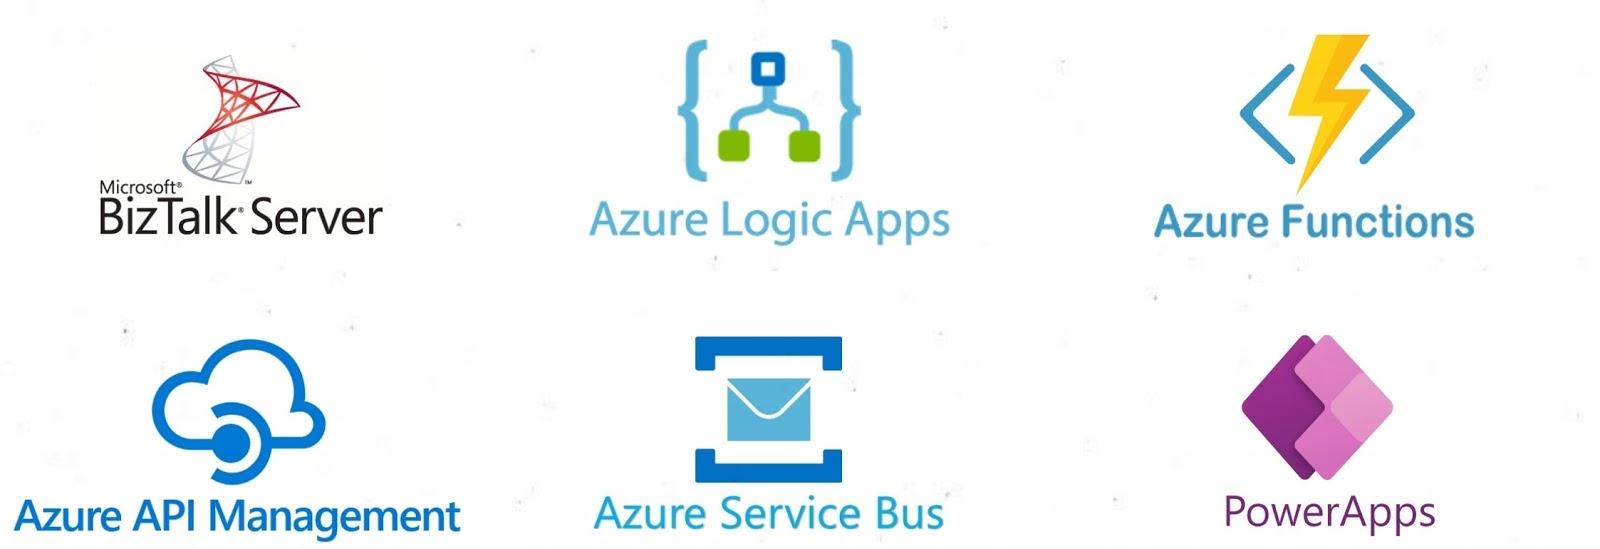 March 1, 2021 Weekly Update on Microsoft Integration Platform & Azure iPaaS